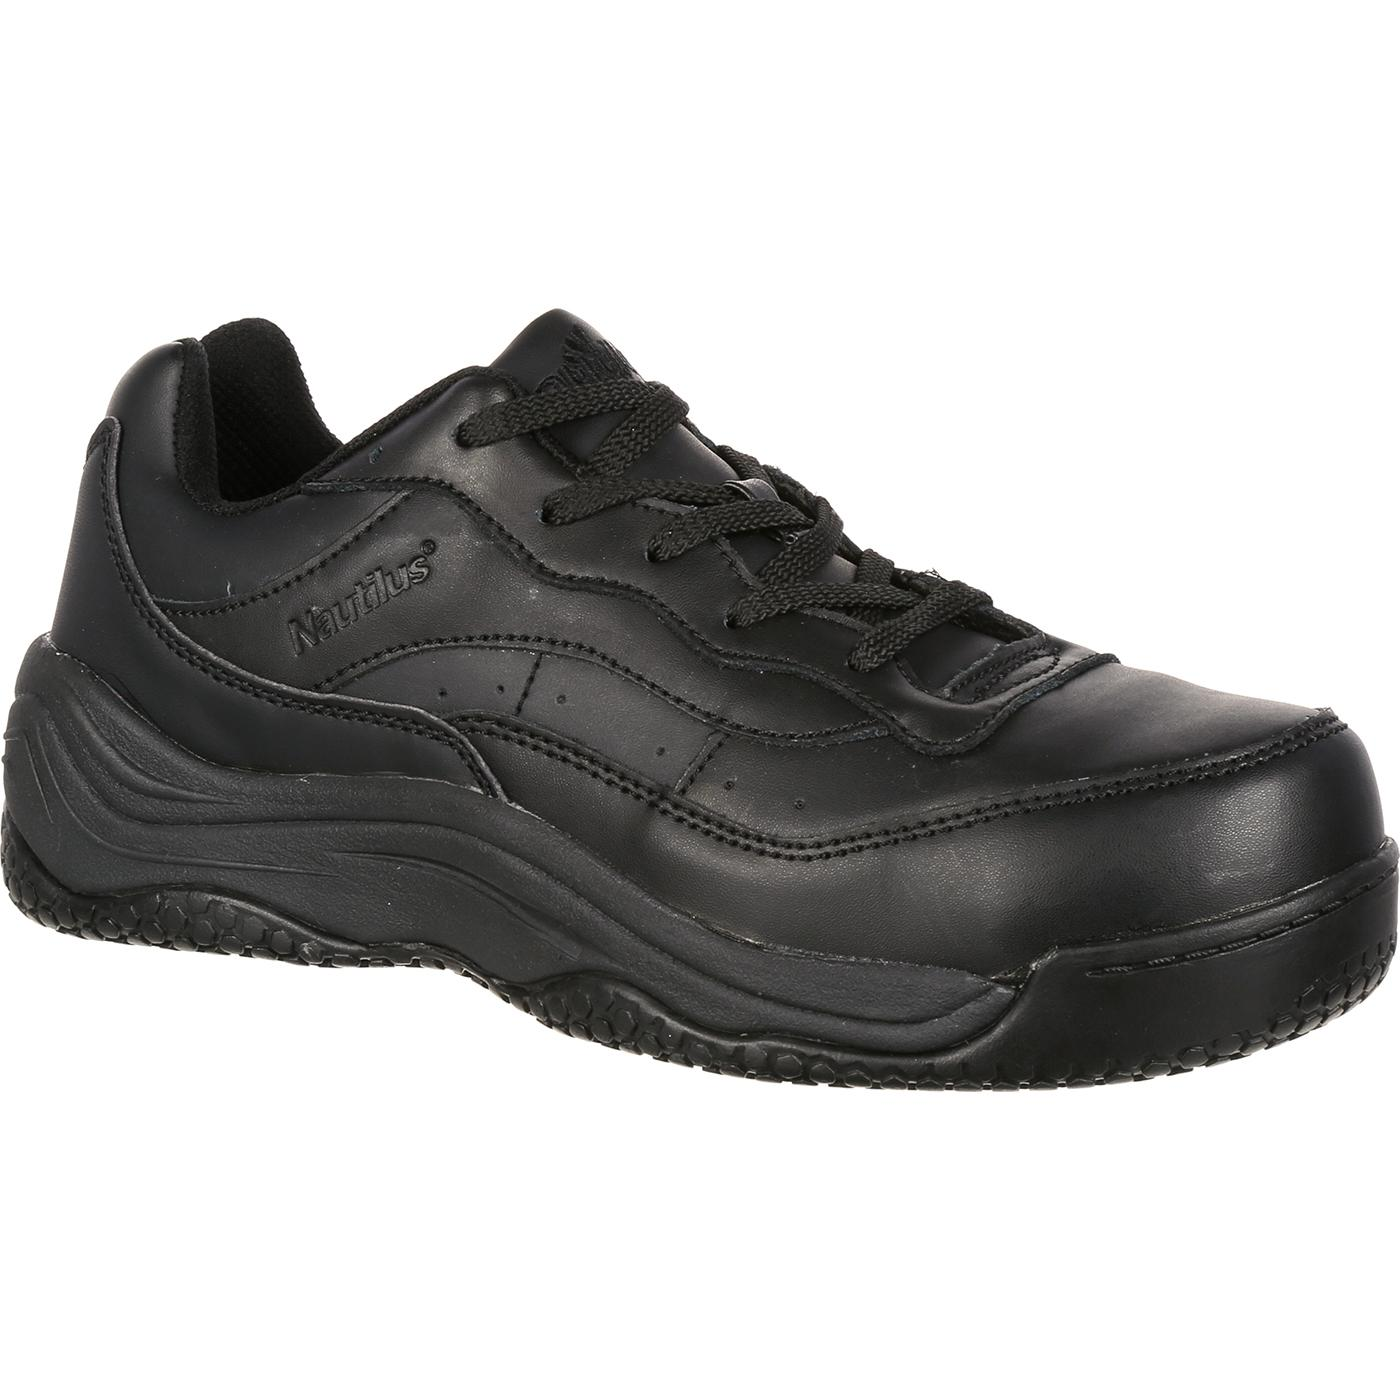 Nautilus Steel Toe Work Shoe